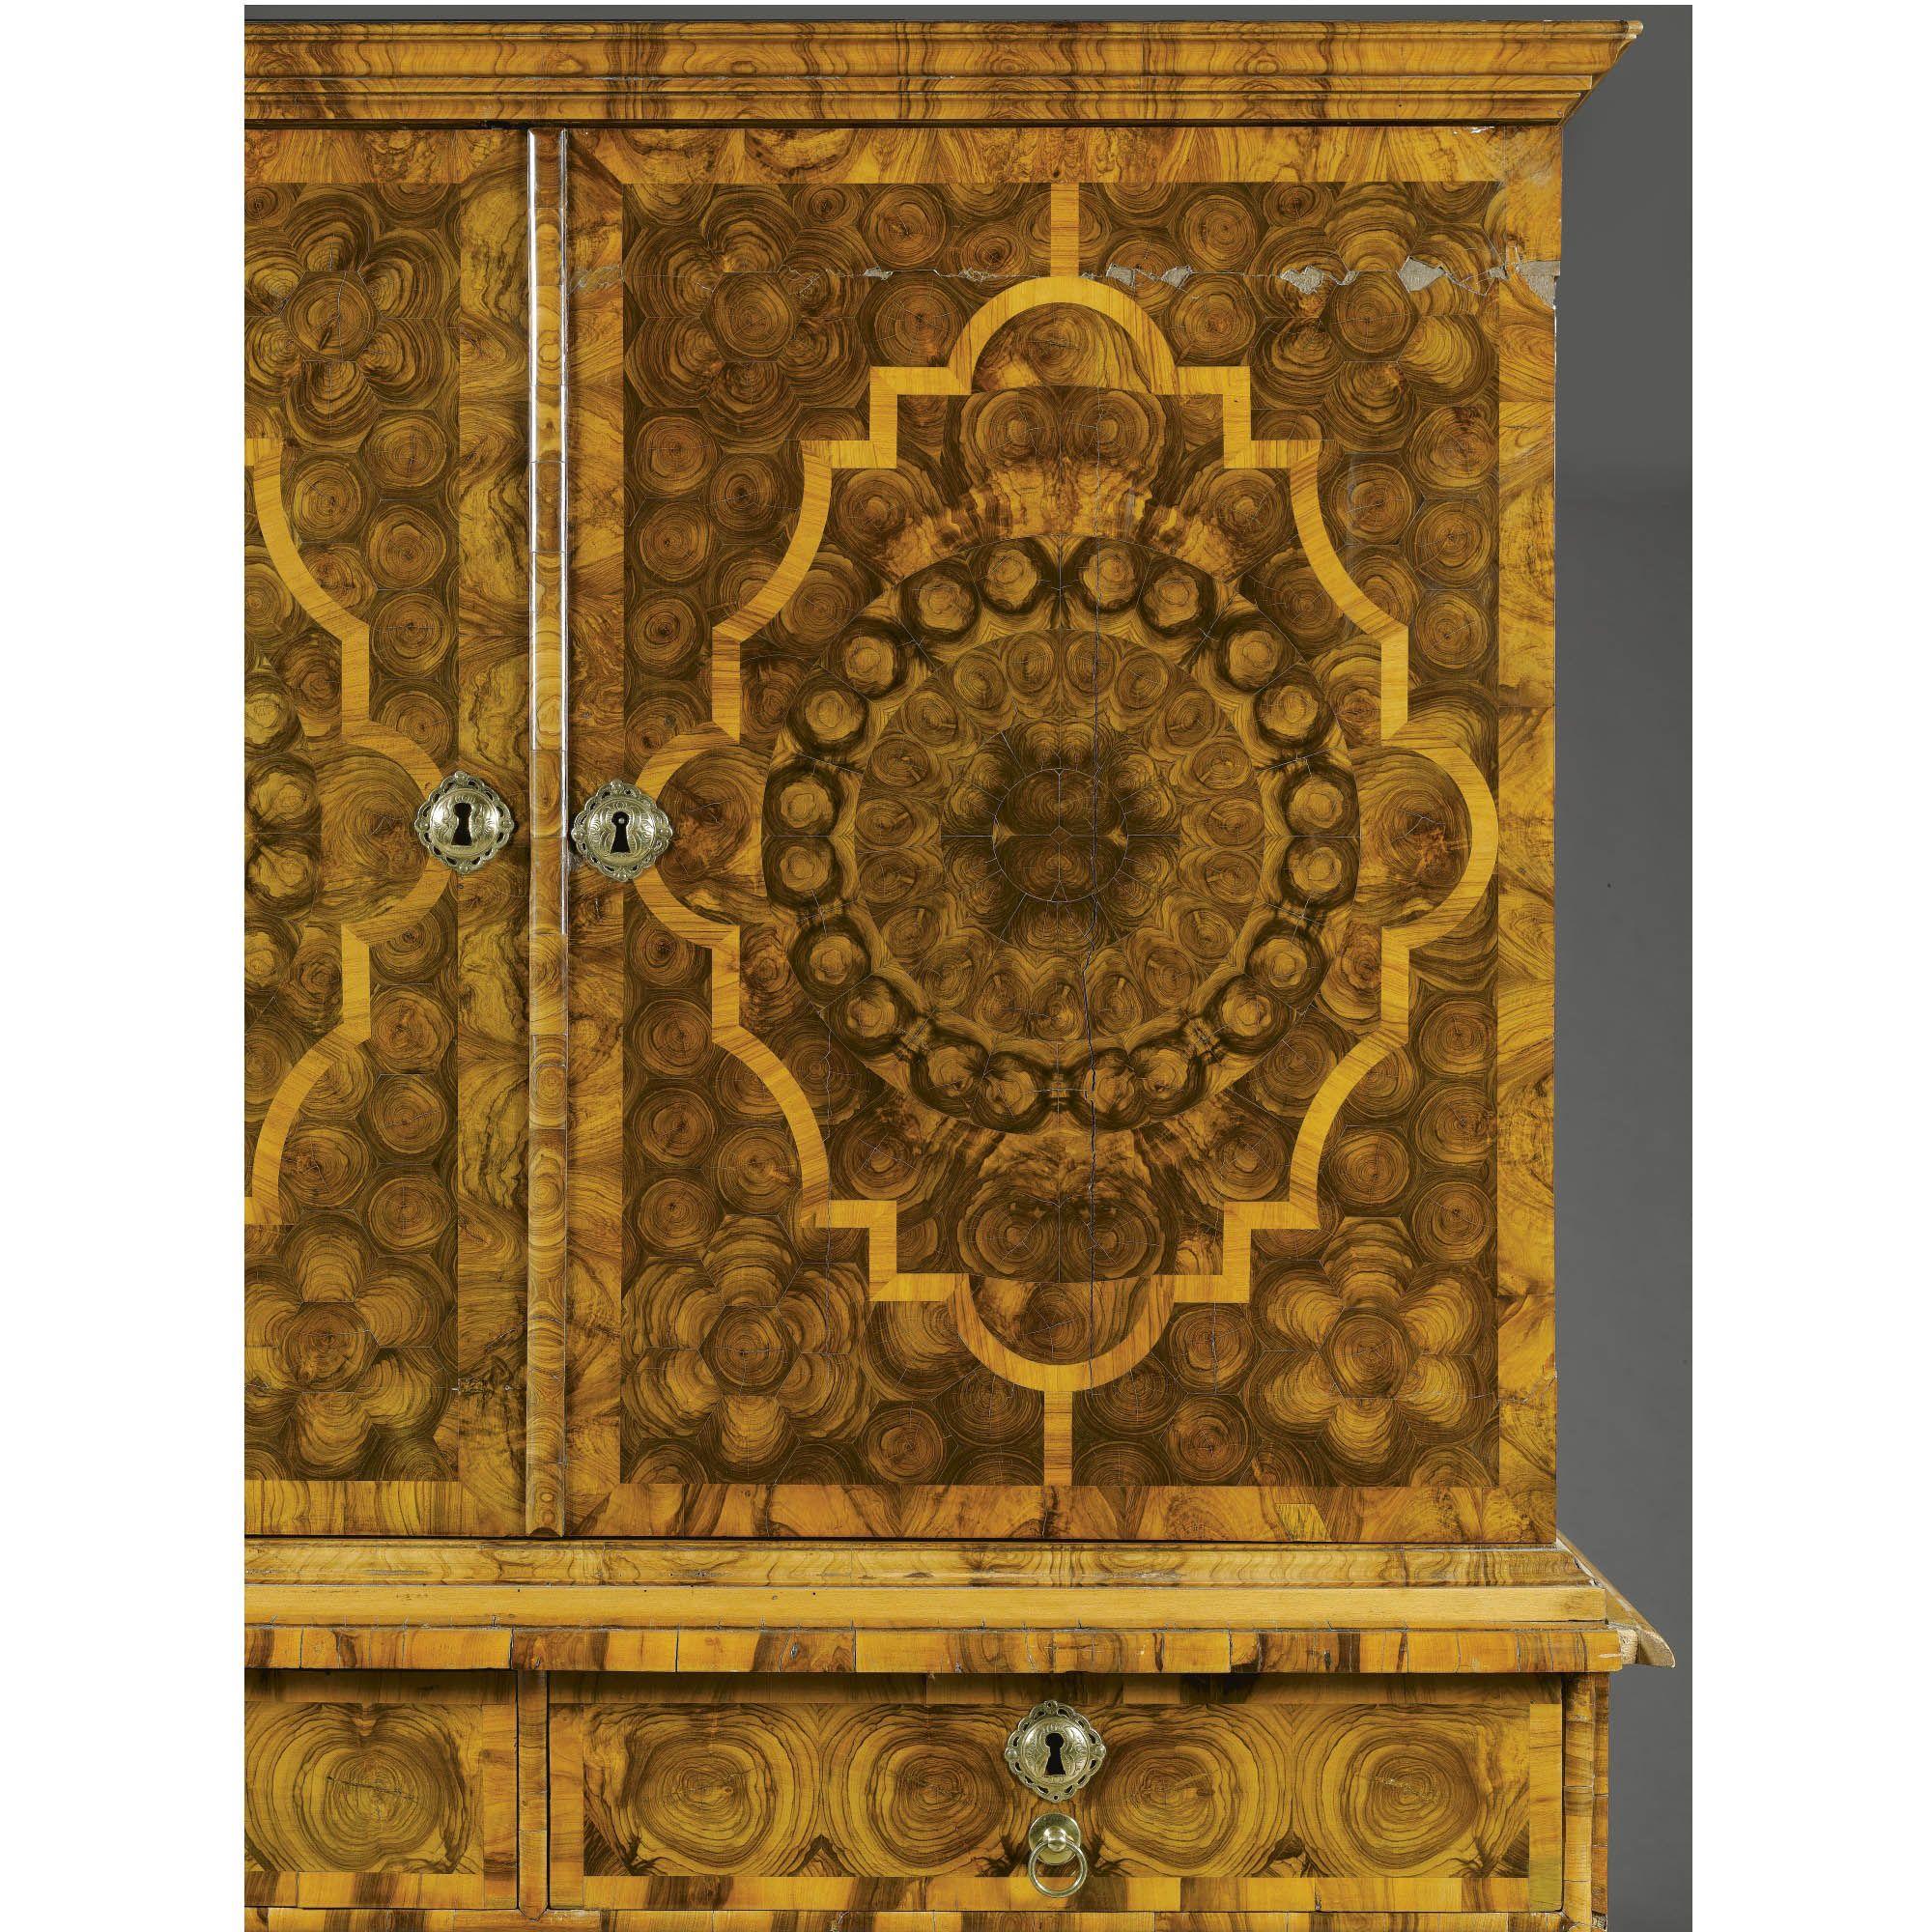 A William And Mary Inlaid Walnut Cabinet On Chestu003cbru003ecirca 1695, Attributed